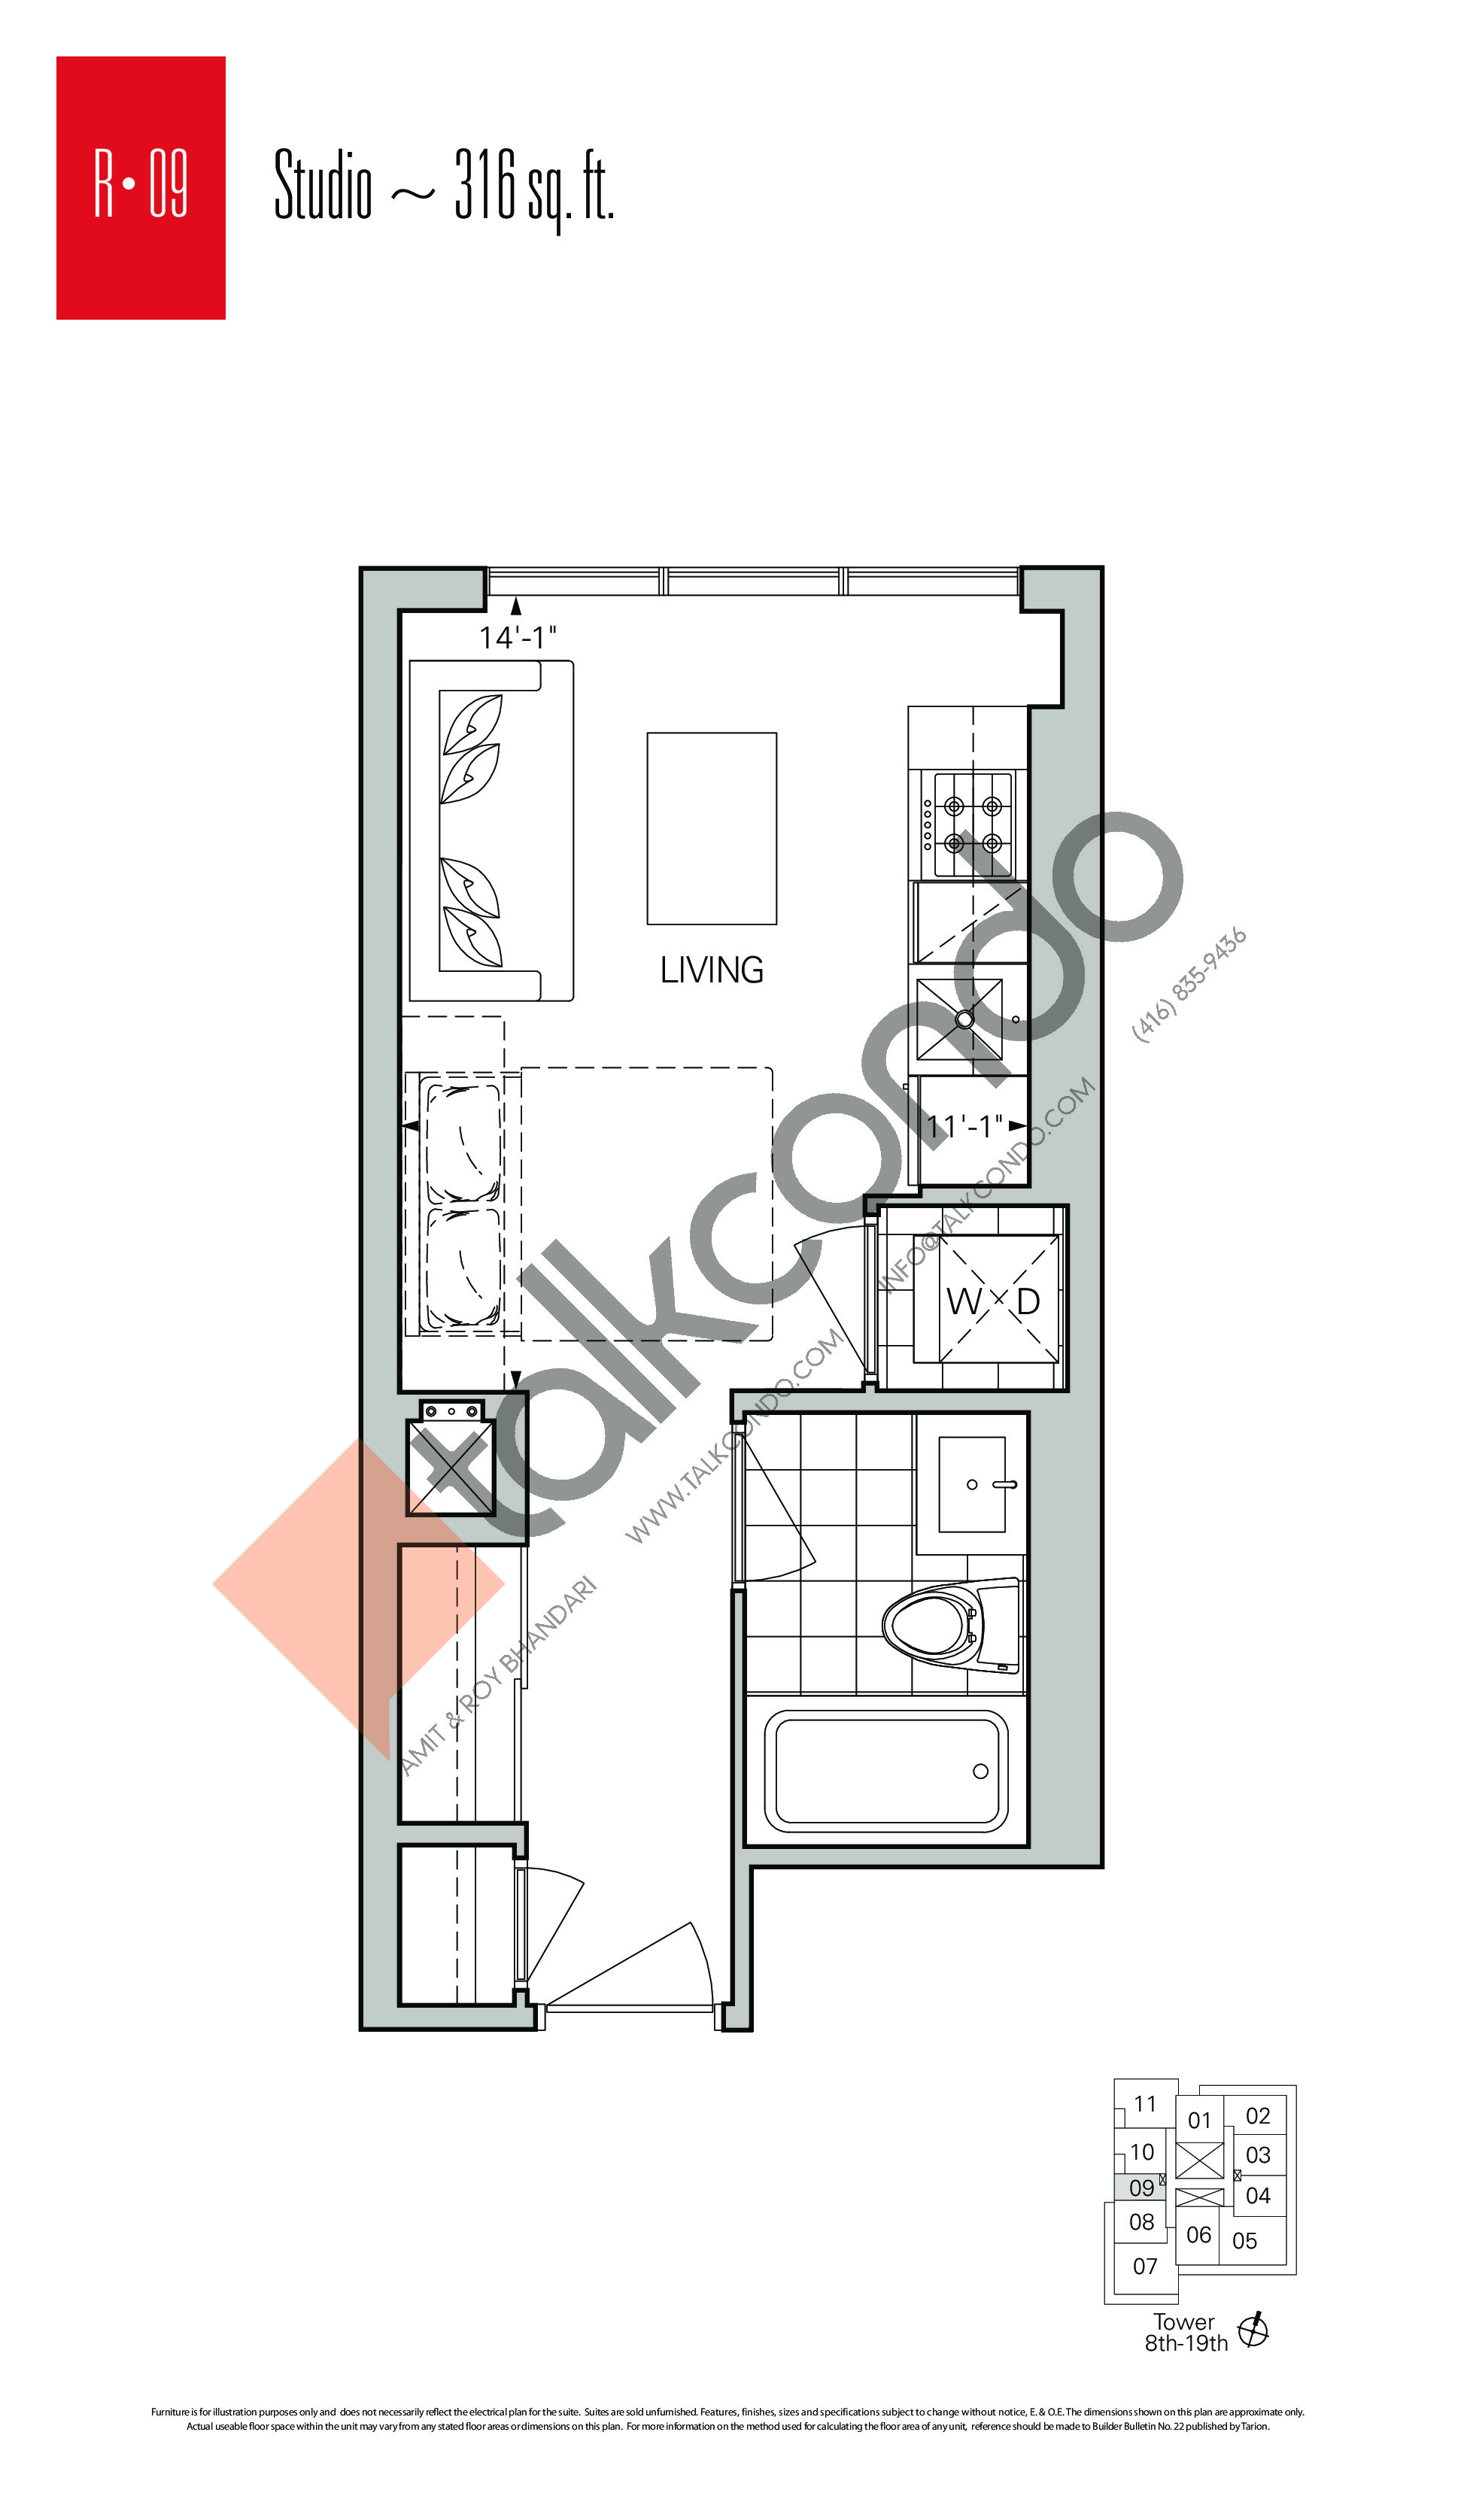 R-09 Floor Plan at Rise Condos - 316 sq.ft